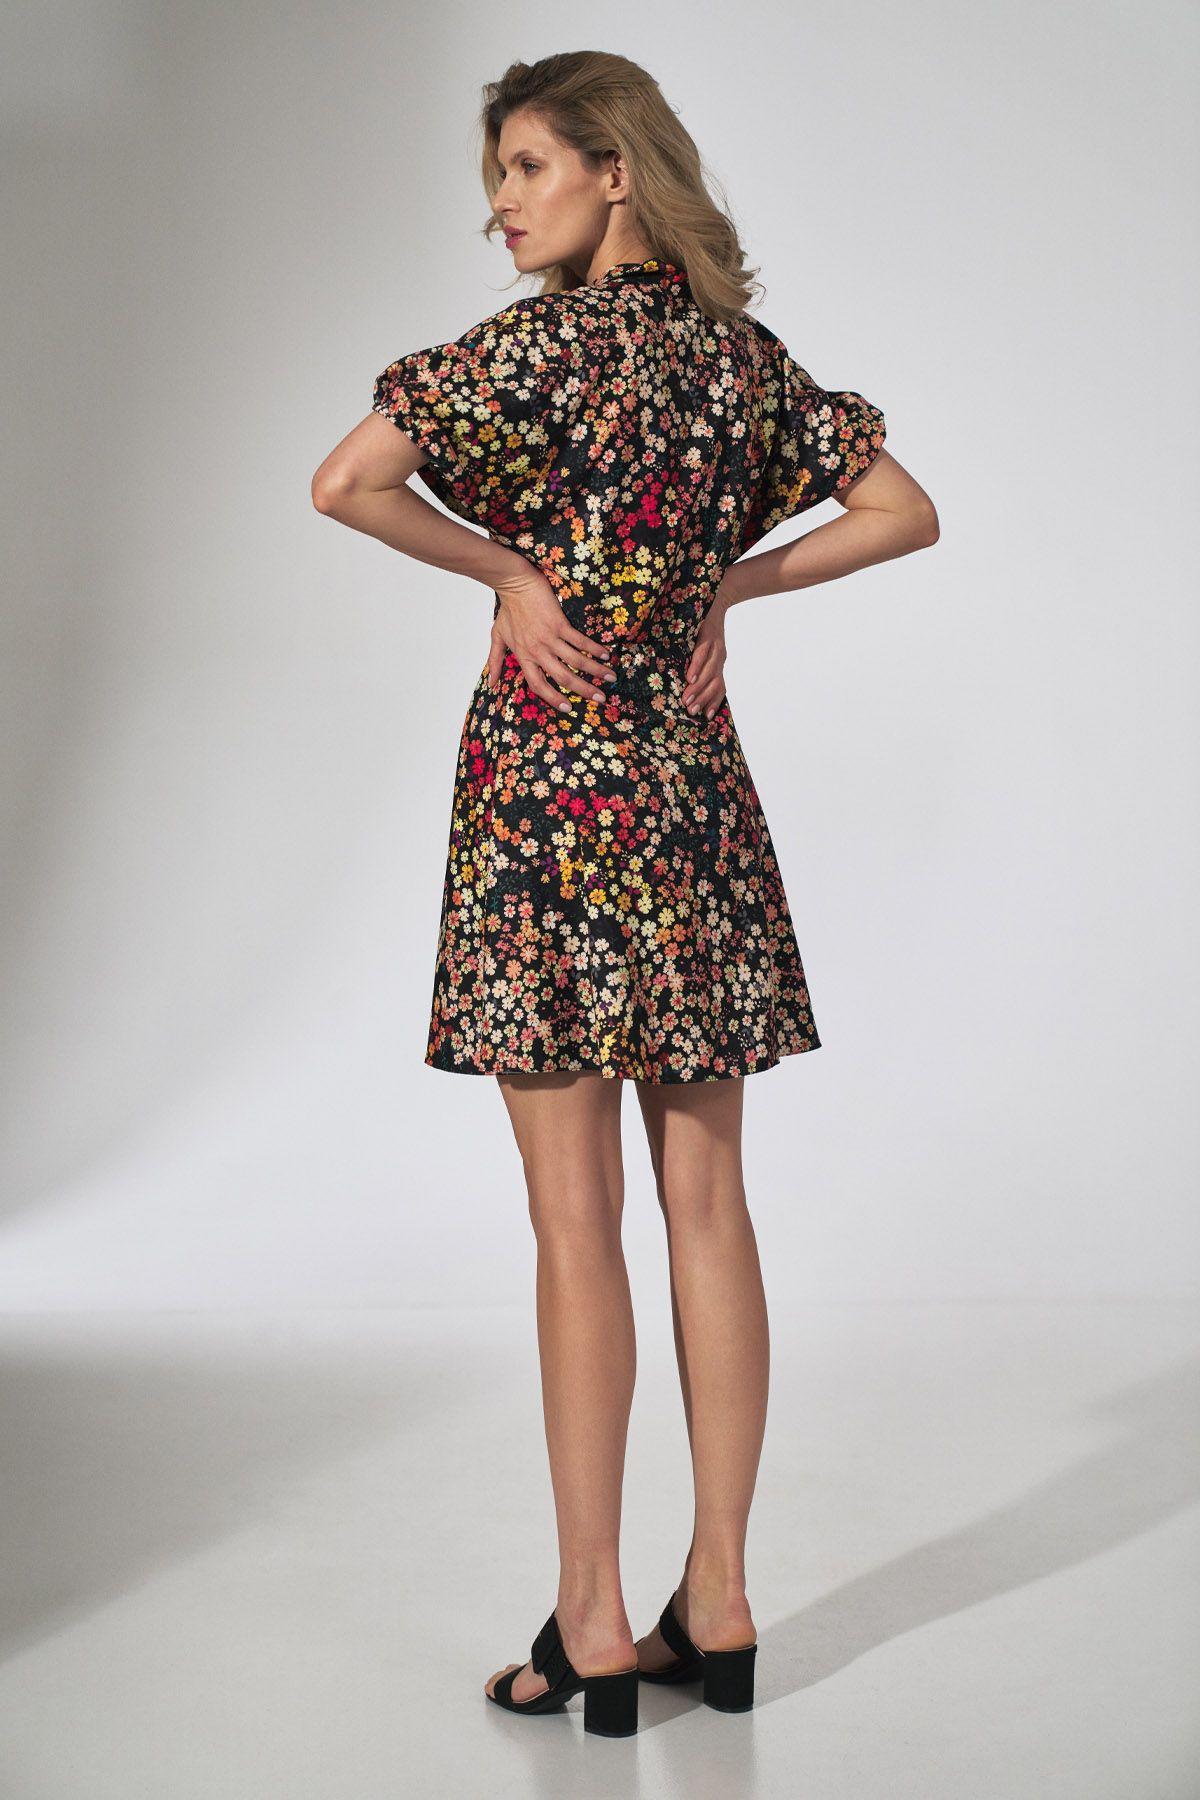 Flower Print Kimono Dress With a Collar